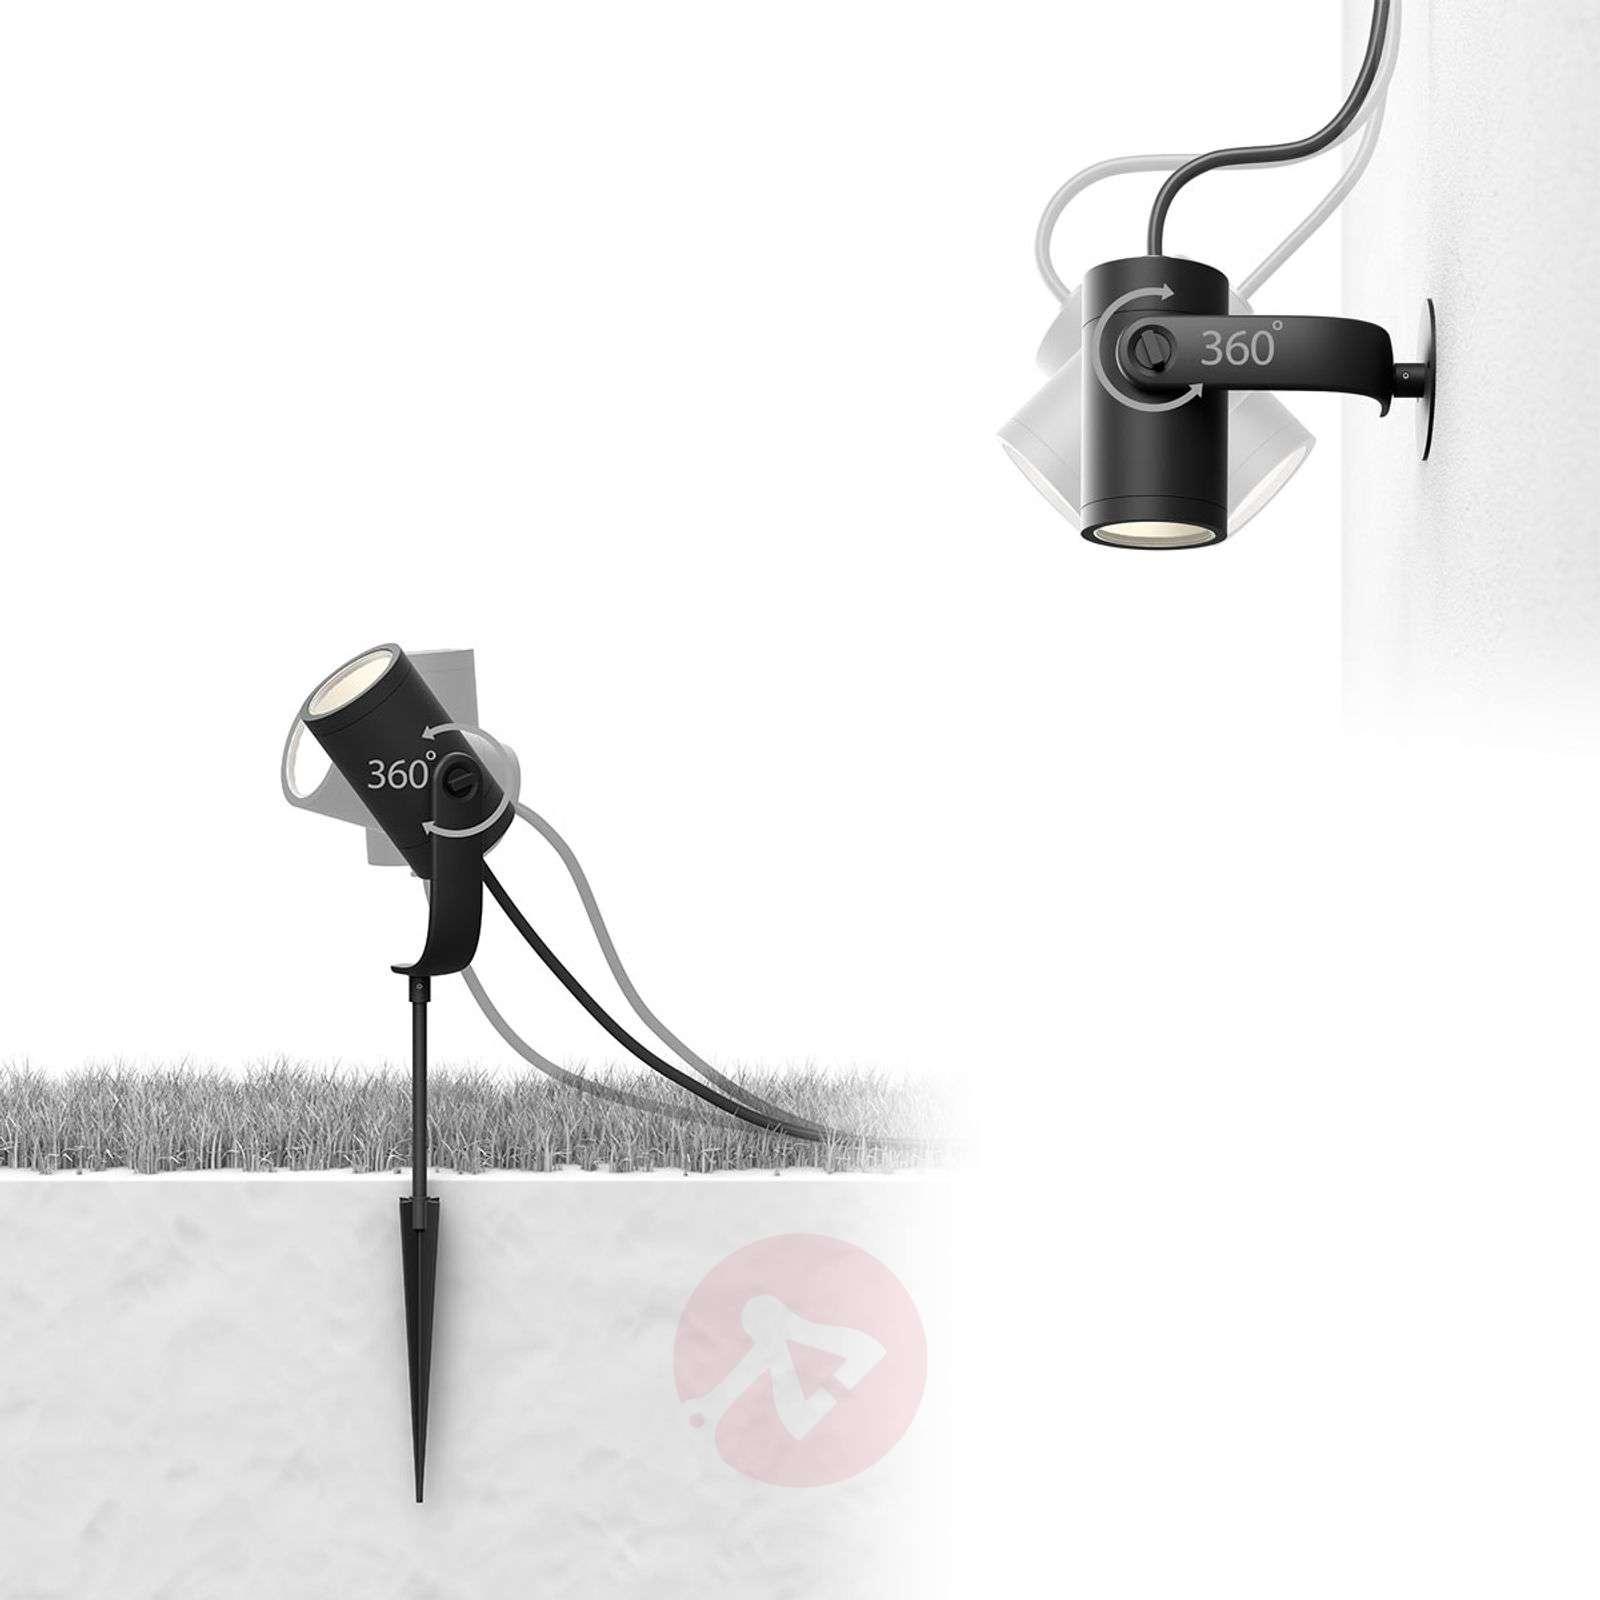 Philips Hue-LED-spotti Lily, ohjaus sovelluksella-7534059-01